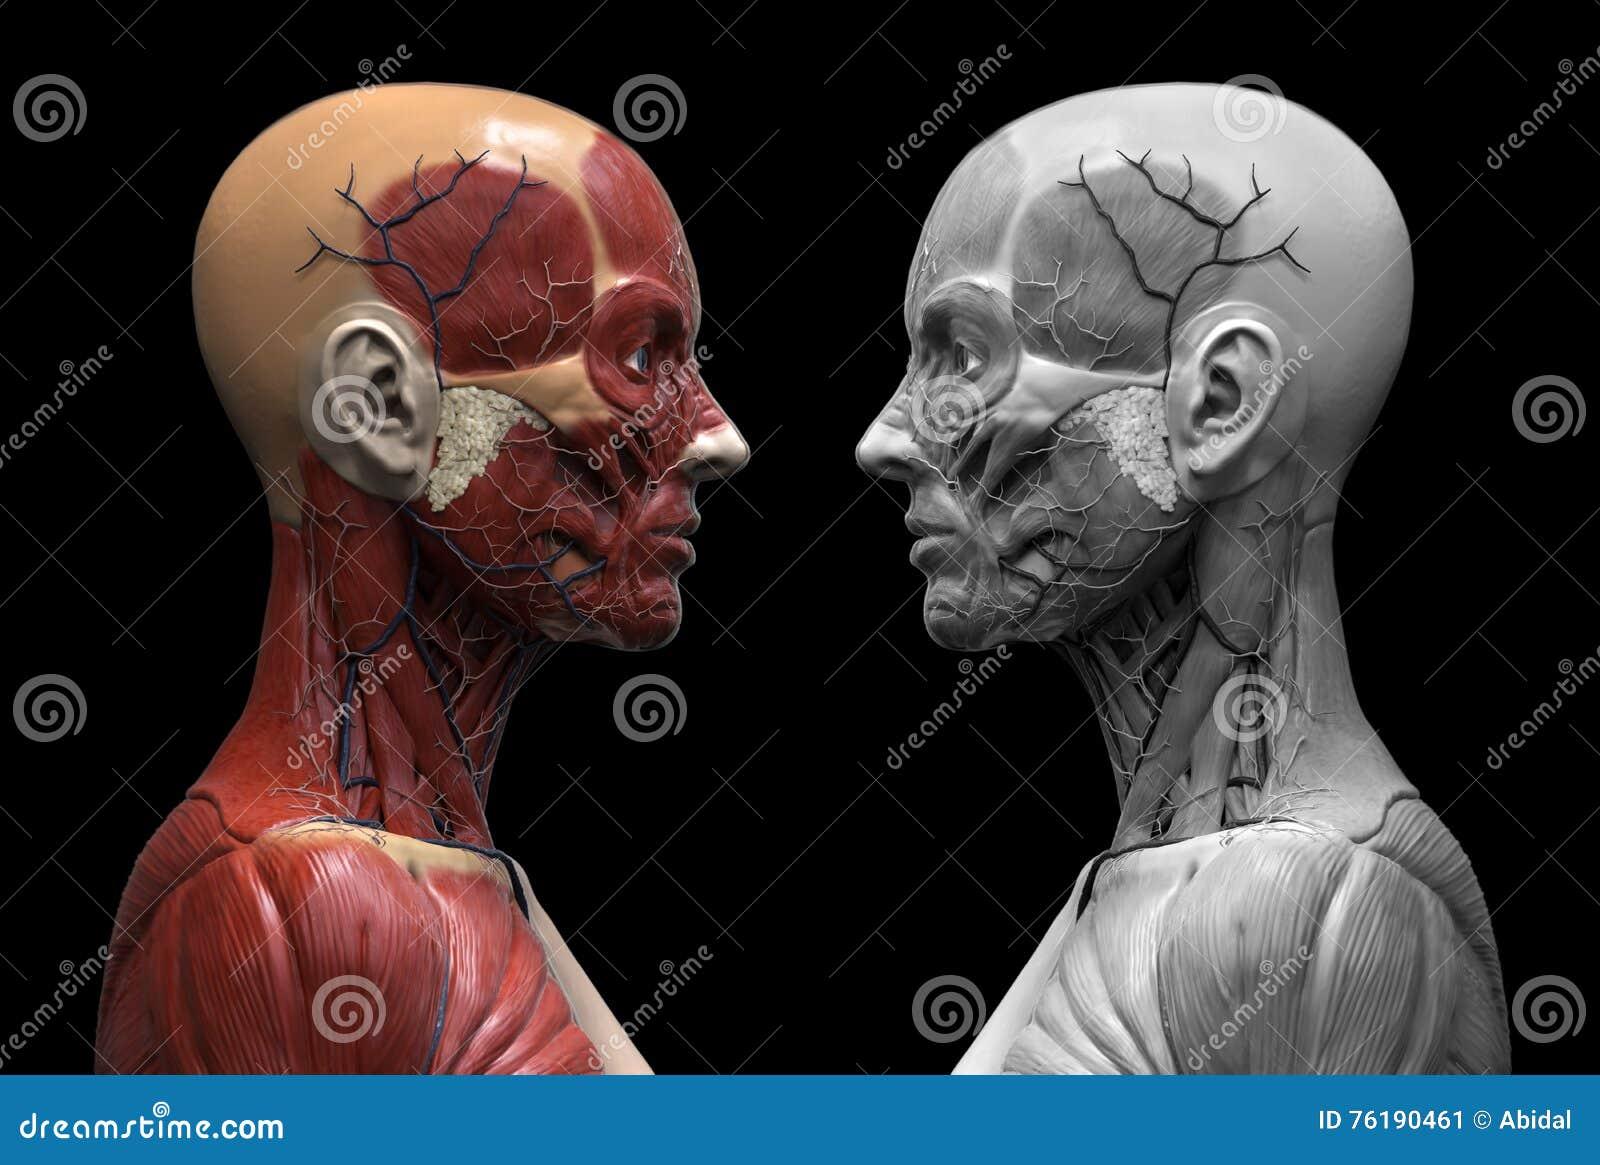 Human Body Anatomy Of A Female Stock Illustration - Illustration of ...